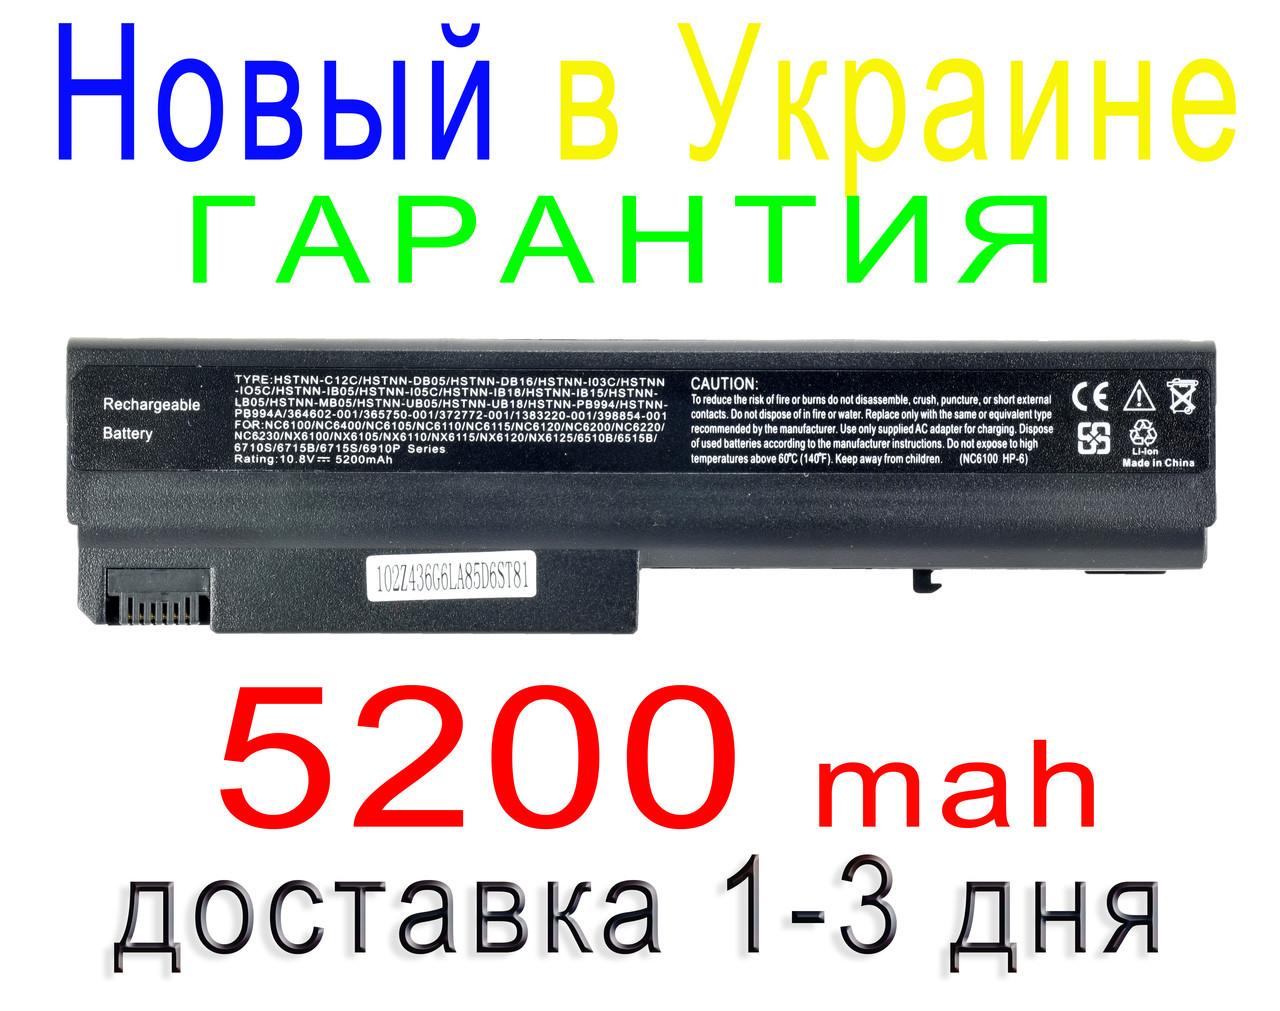 Аккумулятор батарея HSTNN-I23C HSTNN-I27C HSTNN-I36C HSTNN-UB08 HSTNN-UB28 RH270AV